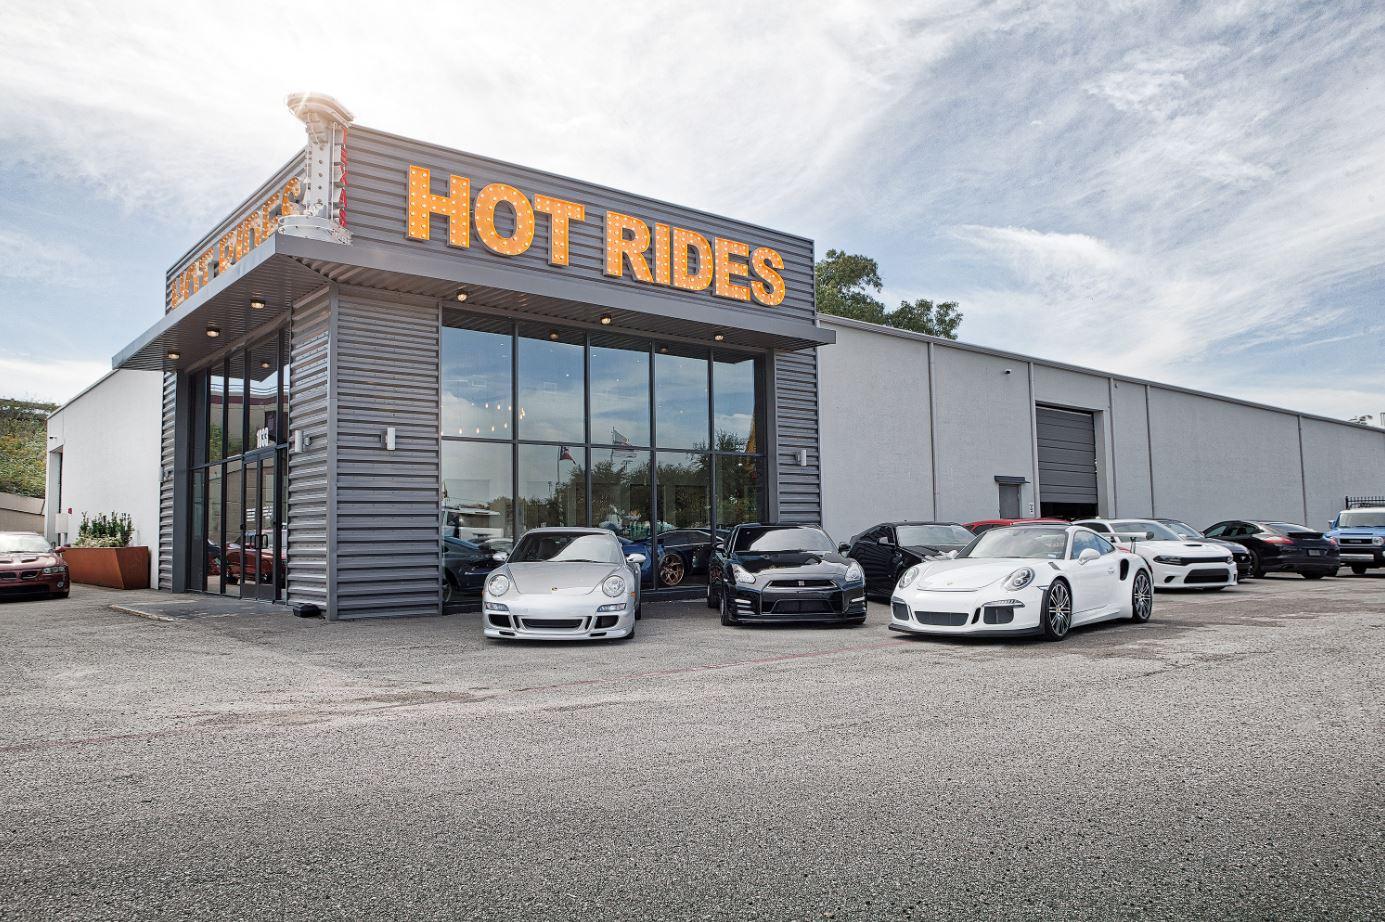 Texas Hot Rides has Hot Rods in Dallas